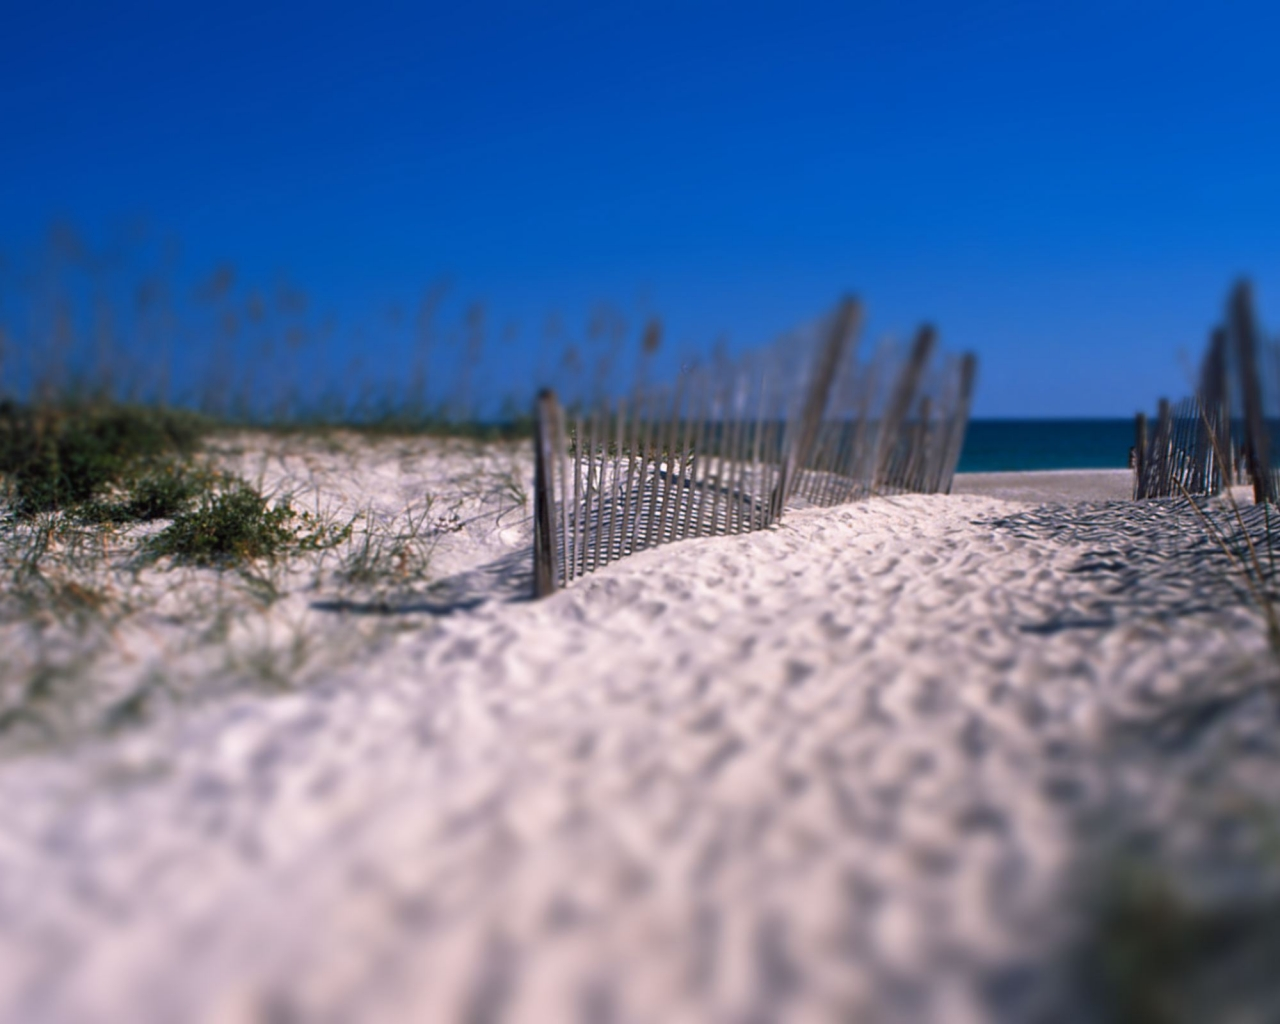 Arena en la playa - 1280x1024